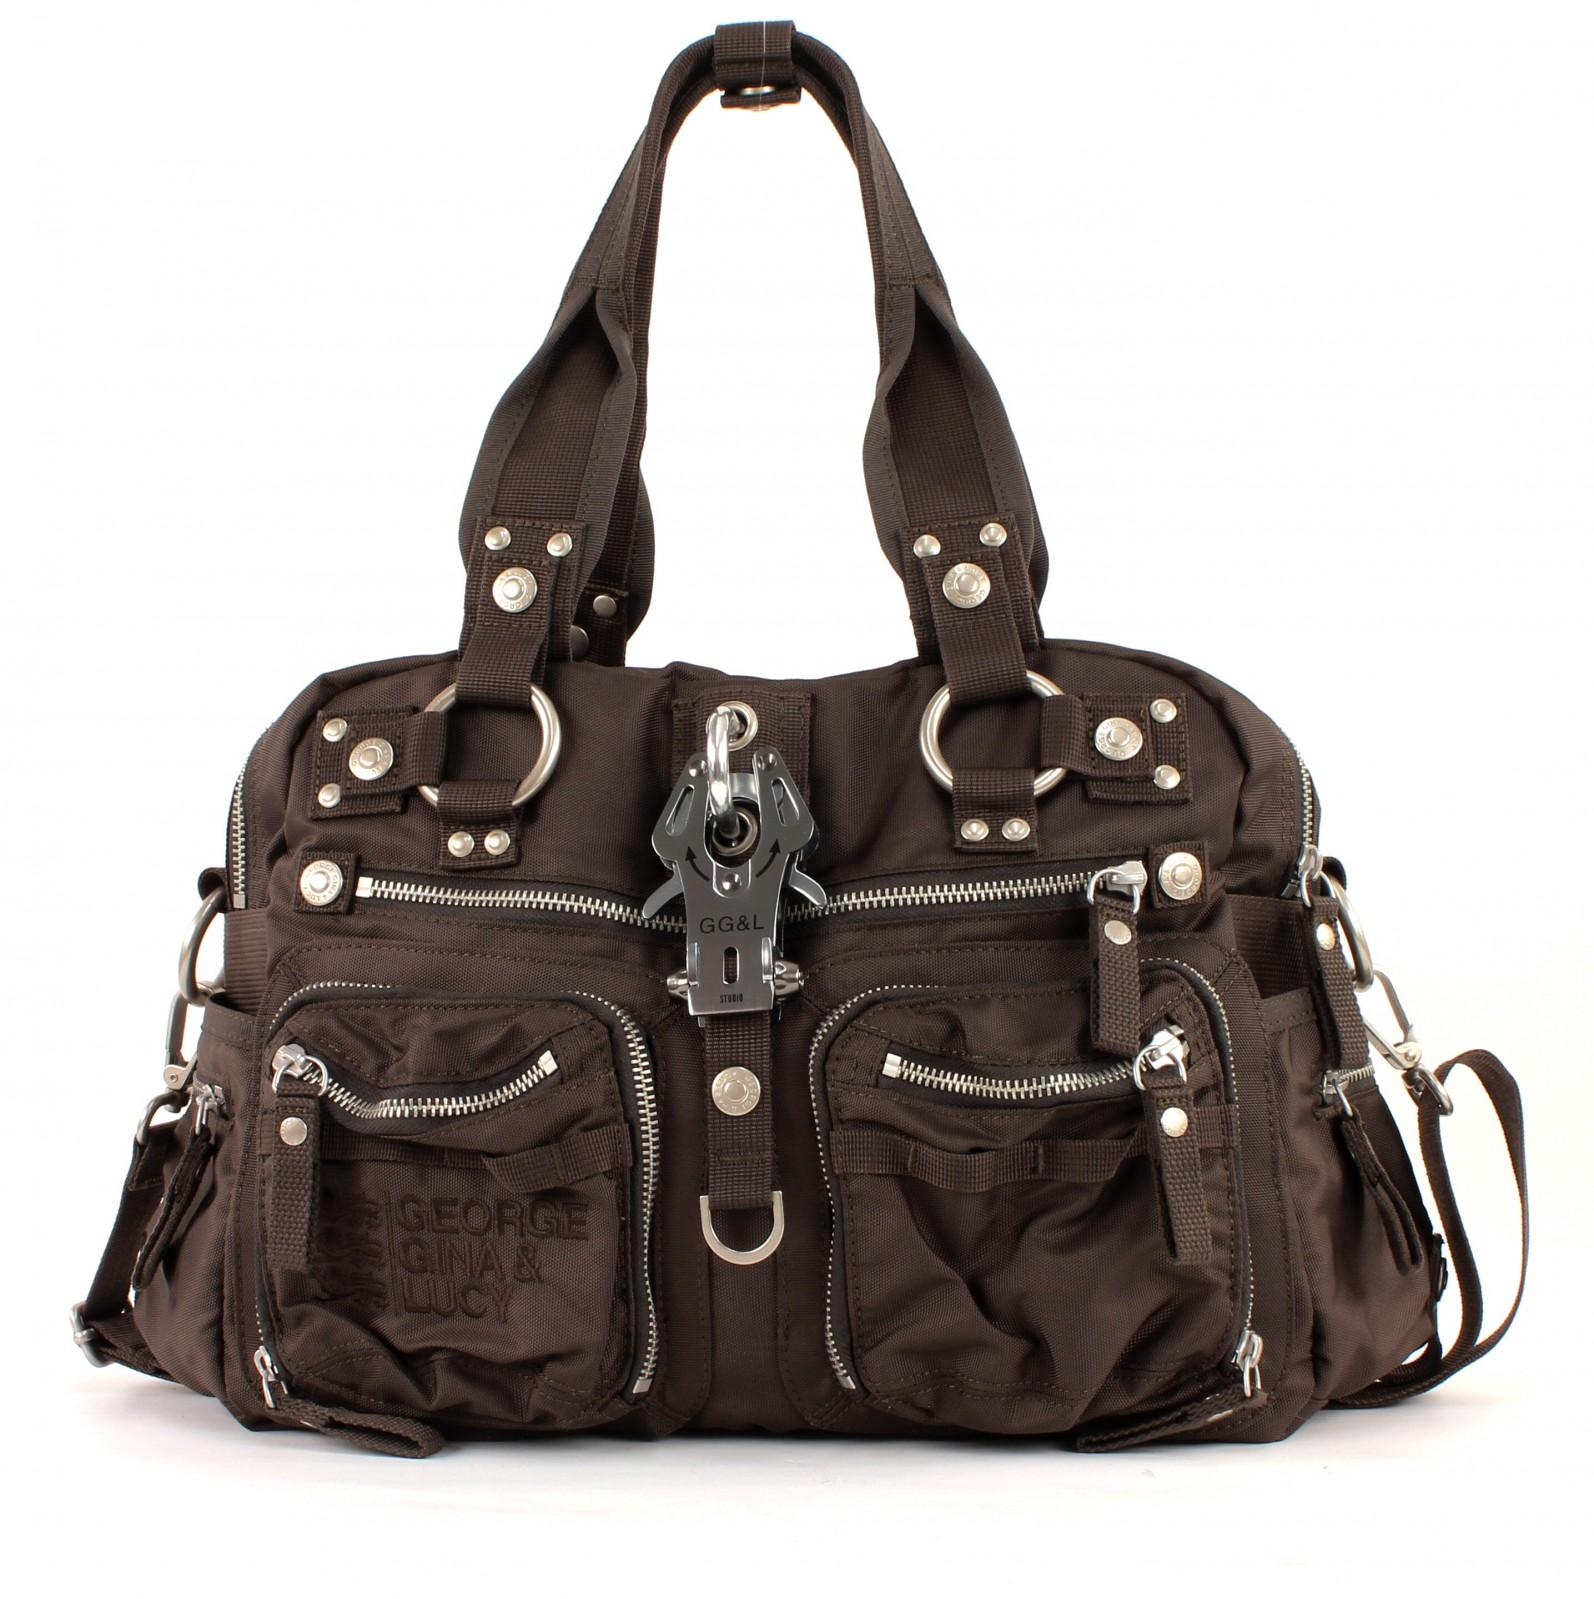 george gina lucy nylon double b tasche handtasche. Black Bedroom Furniture Sets. Home Design Ideas